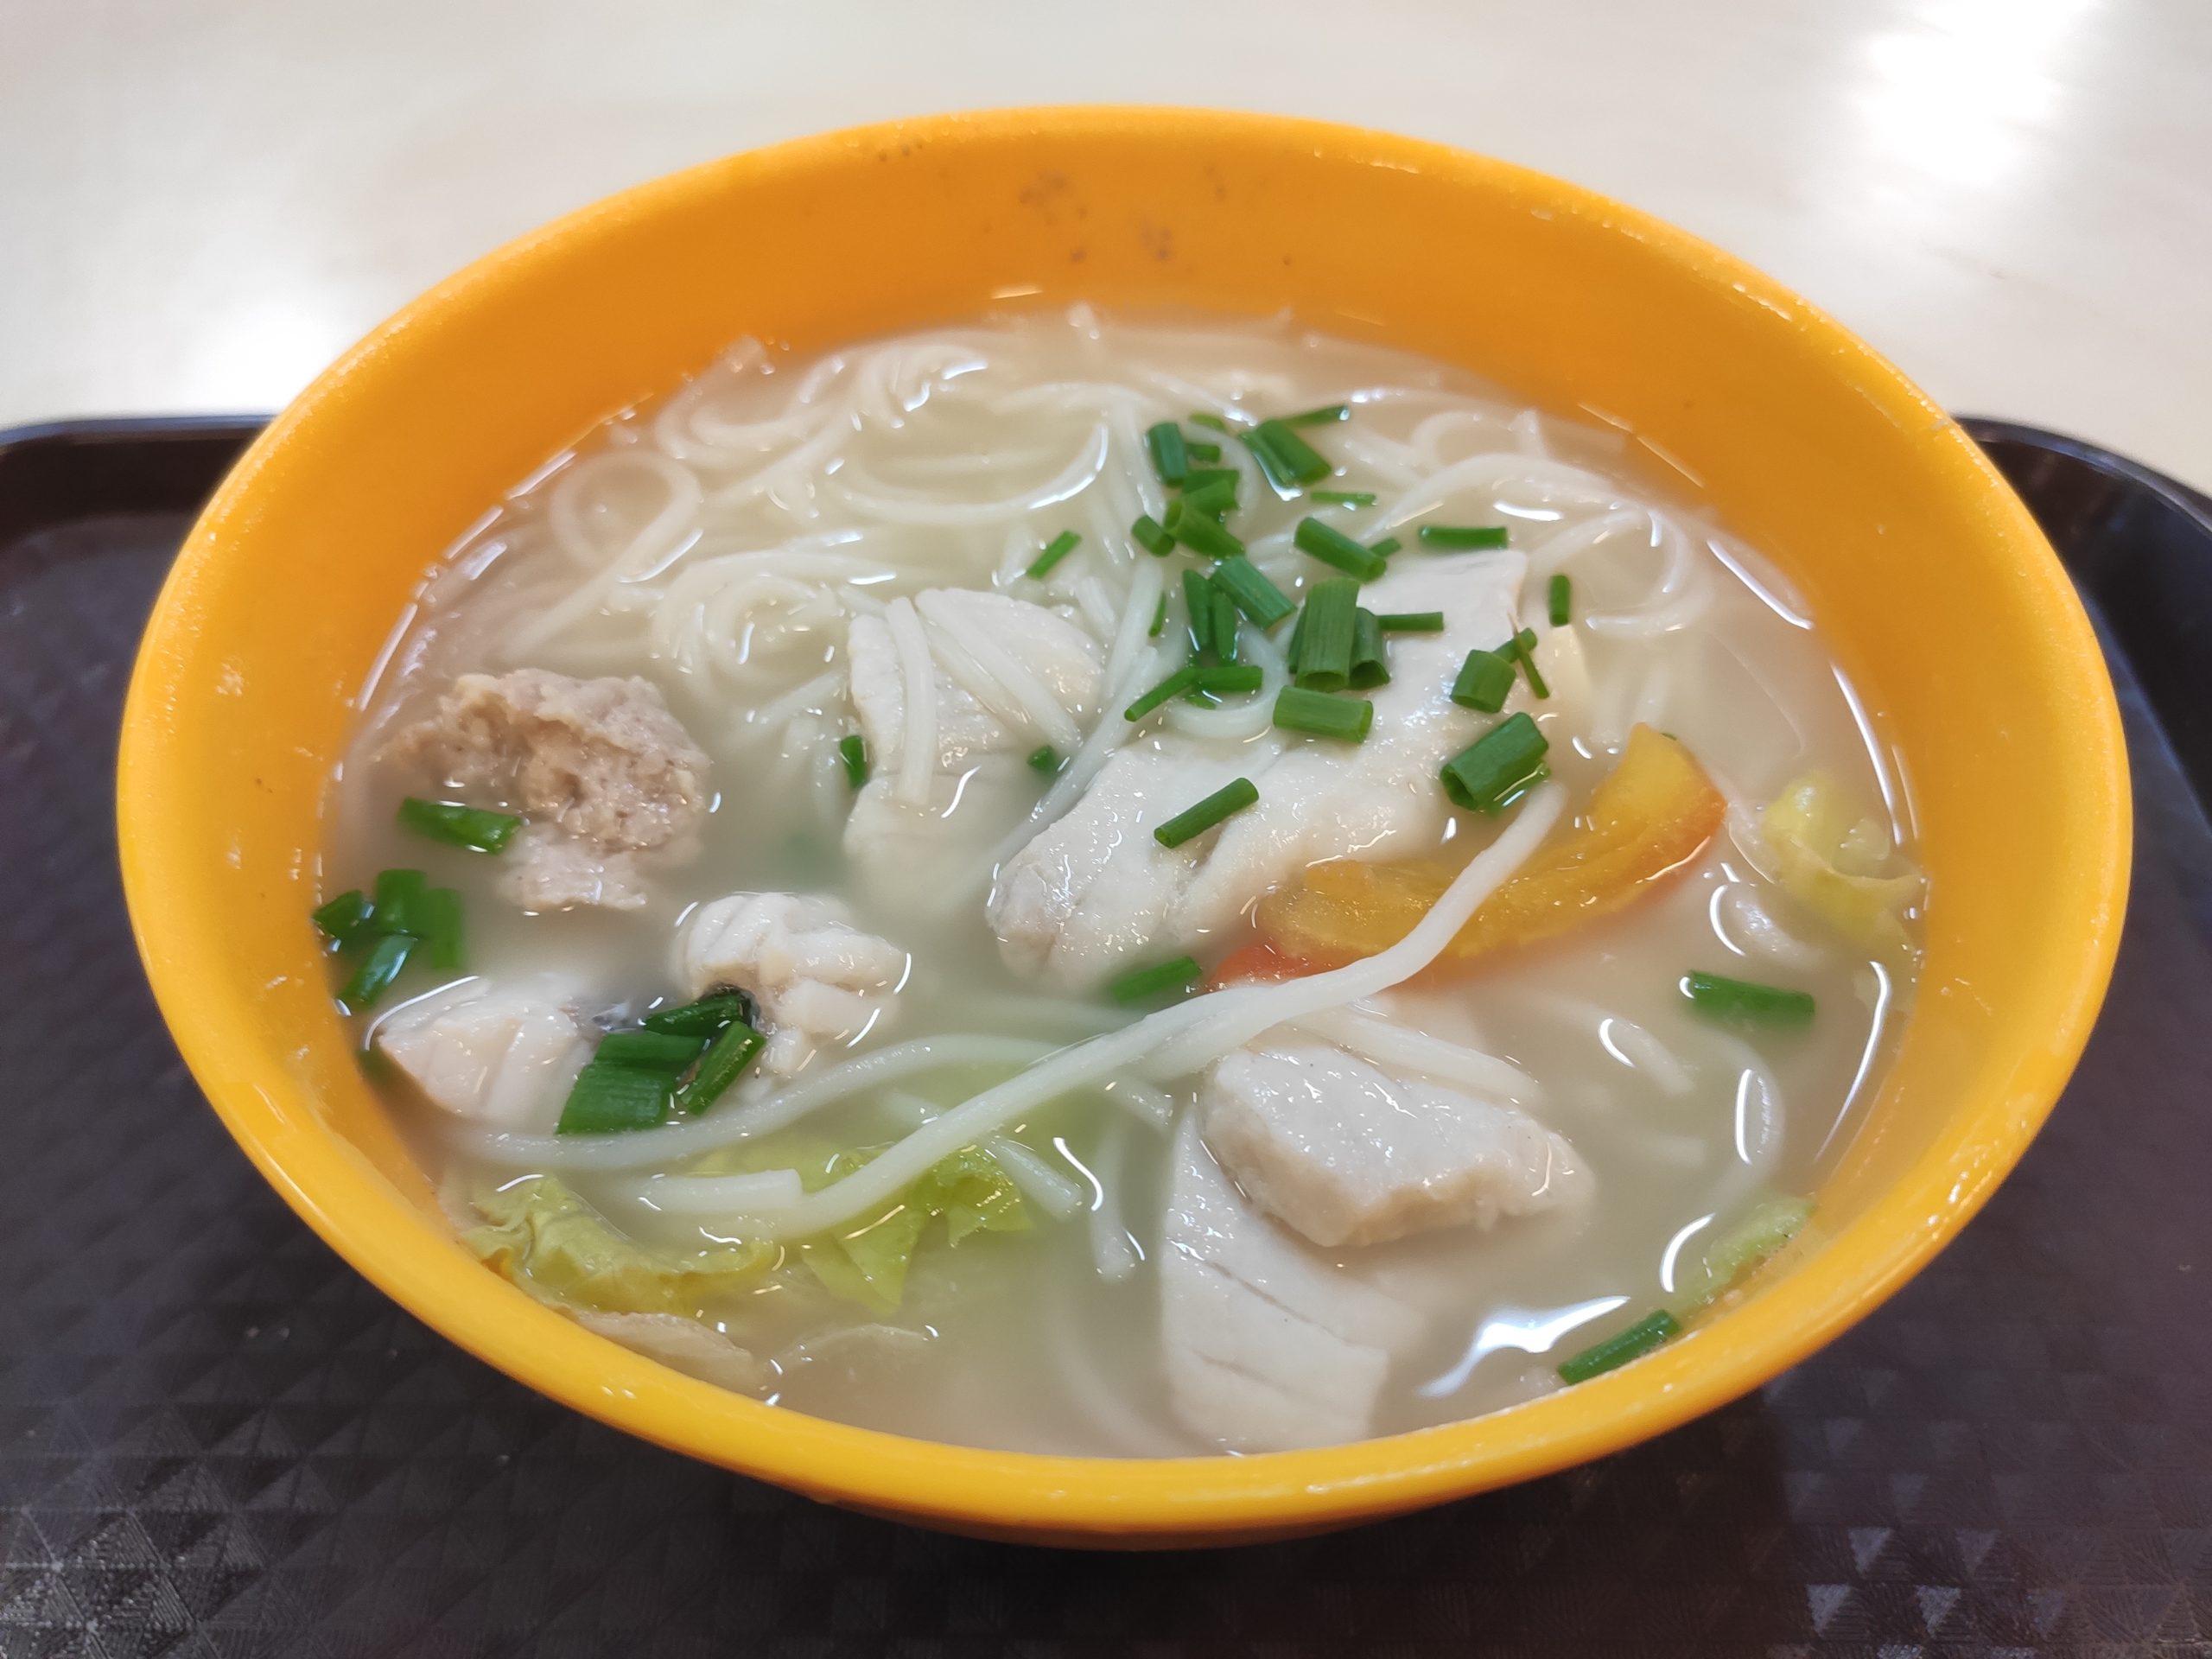 Tanglin Halt Sliced Fish Soup: Sliced Fish Soup with Mee Hoon